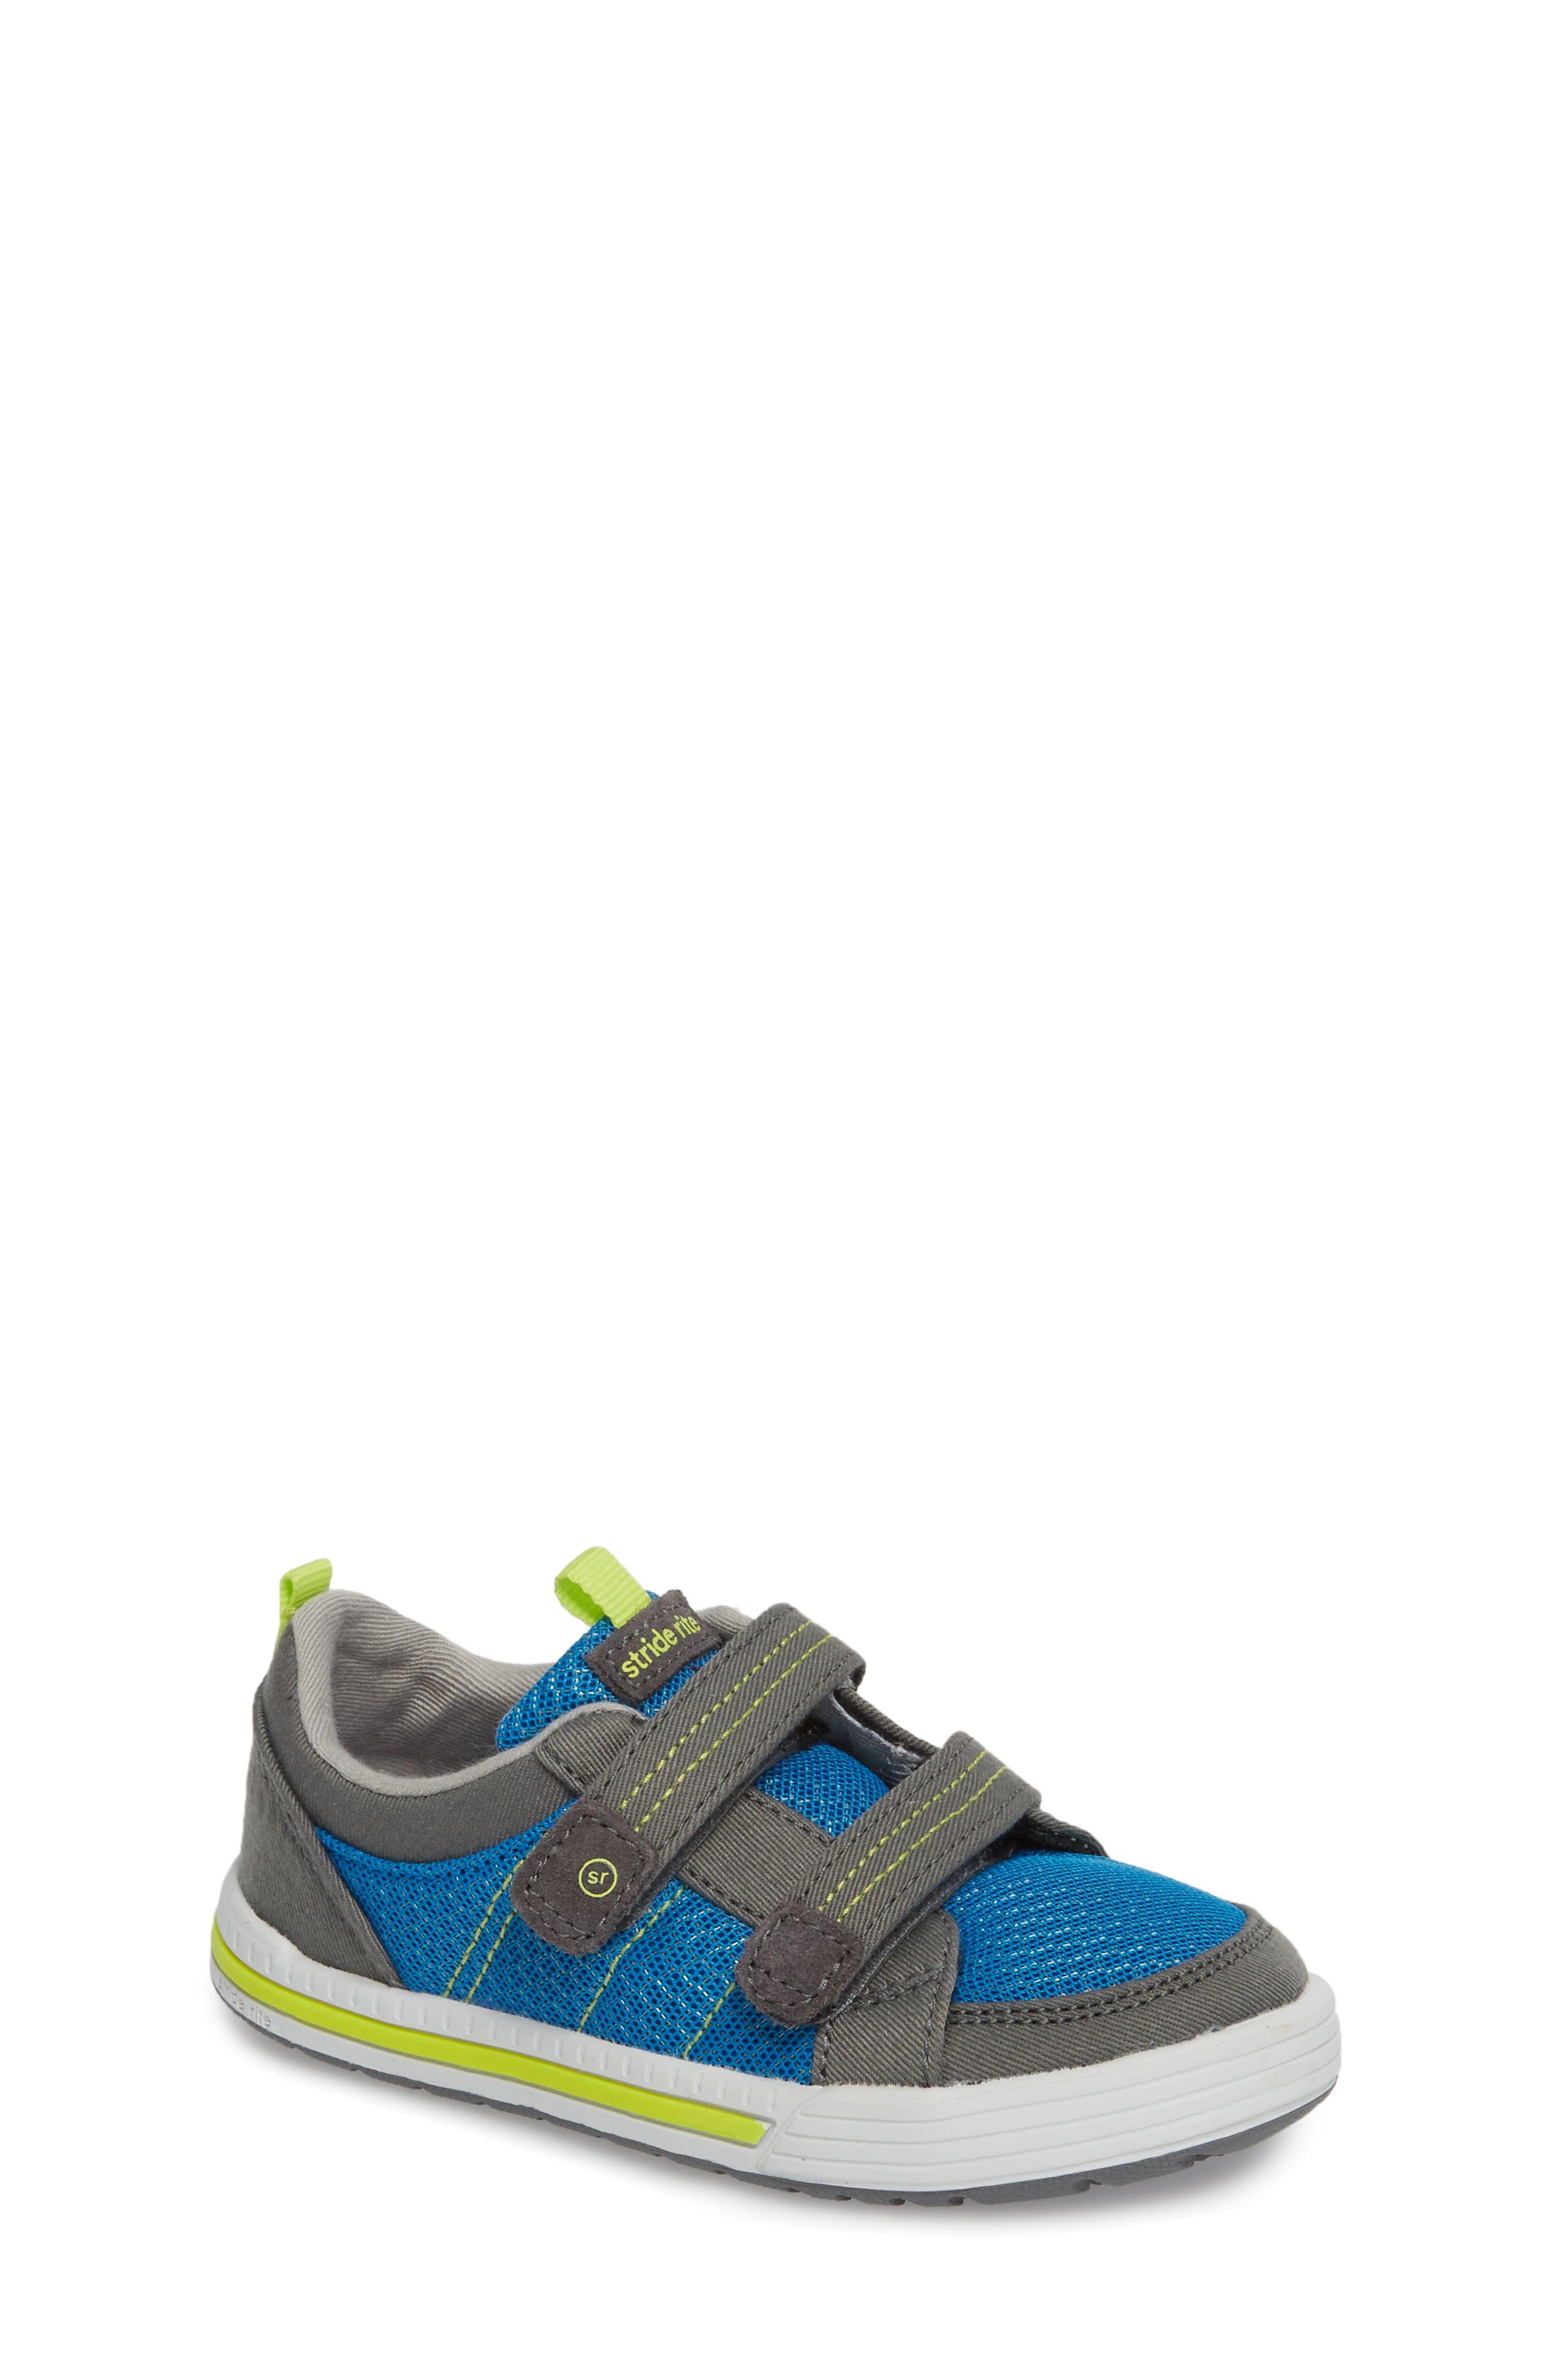 Logan Sneaker,                             Main thumbnail 1, color,                             Blue/ Grey